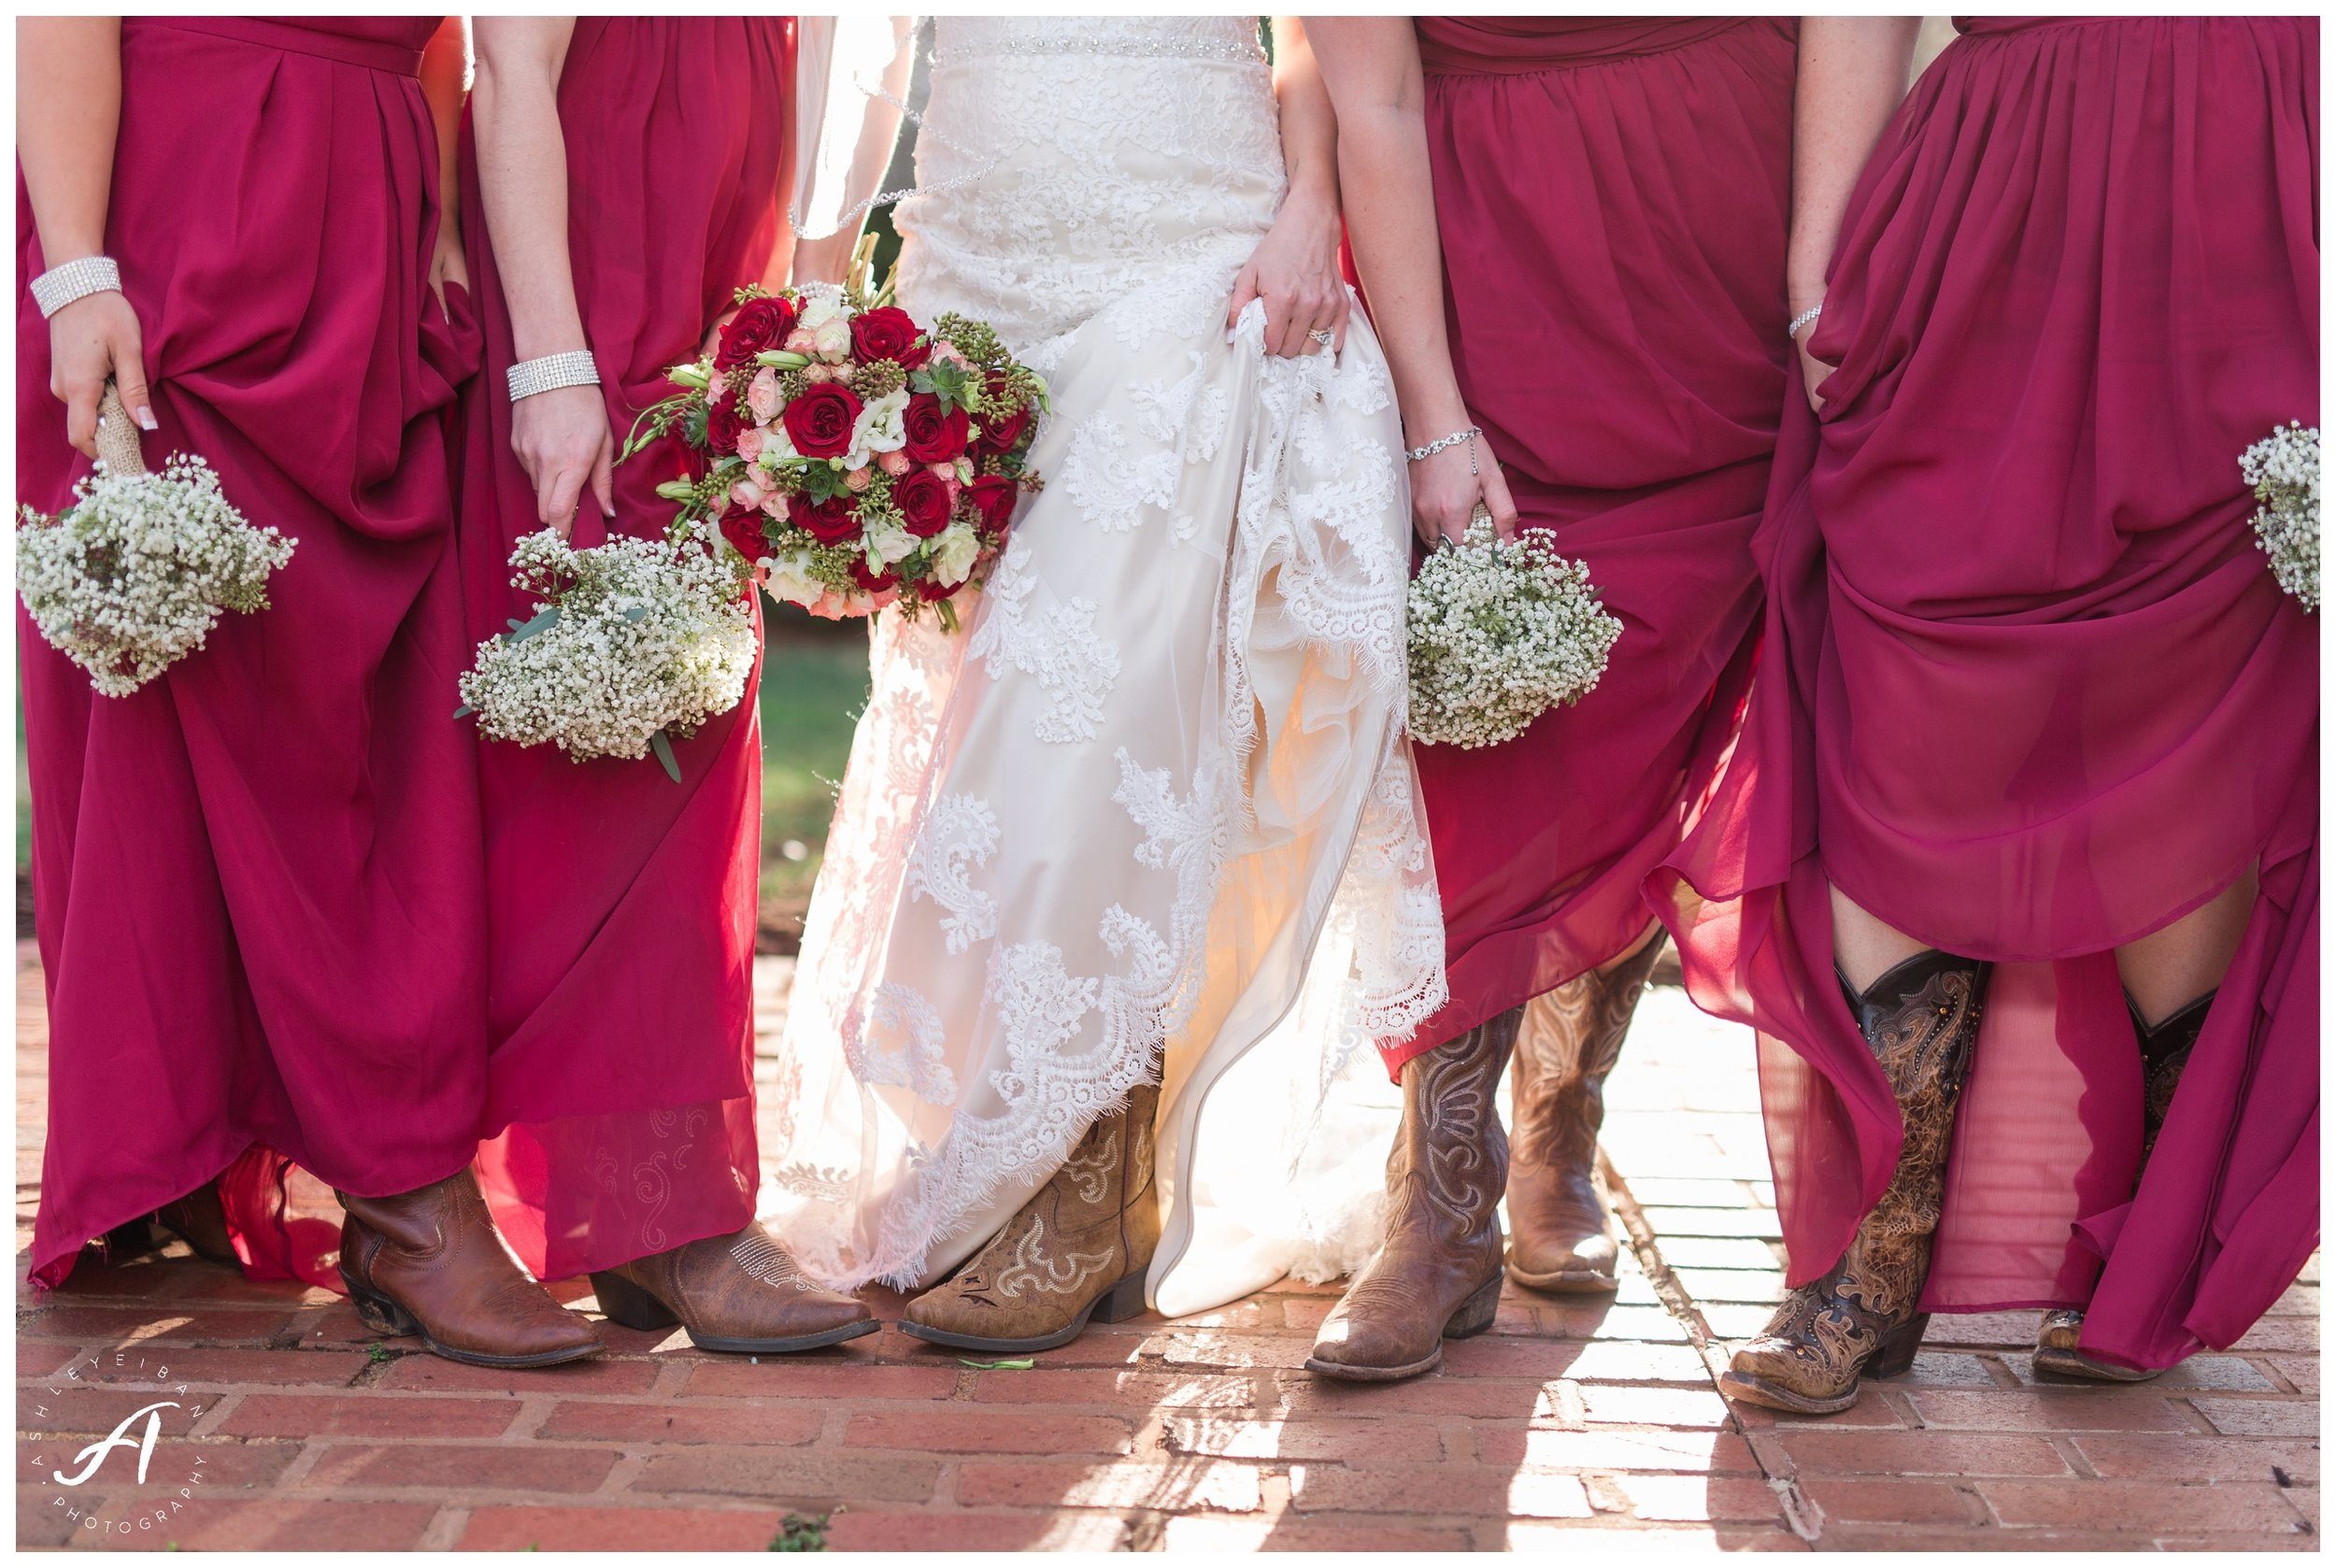 Central Virginia Wedding at The Trivium Estate    Forest and Lynchburg Wedding Photographer    Ashley Eiban Photography    www.ashleyeiban.com